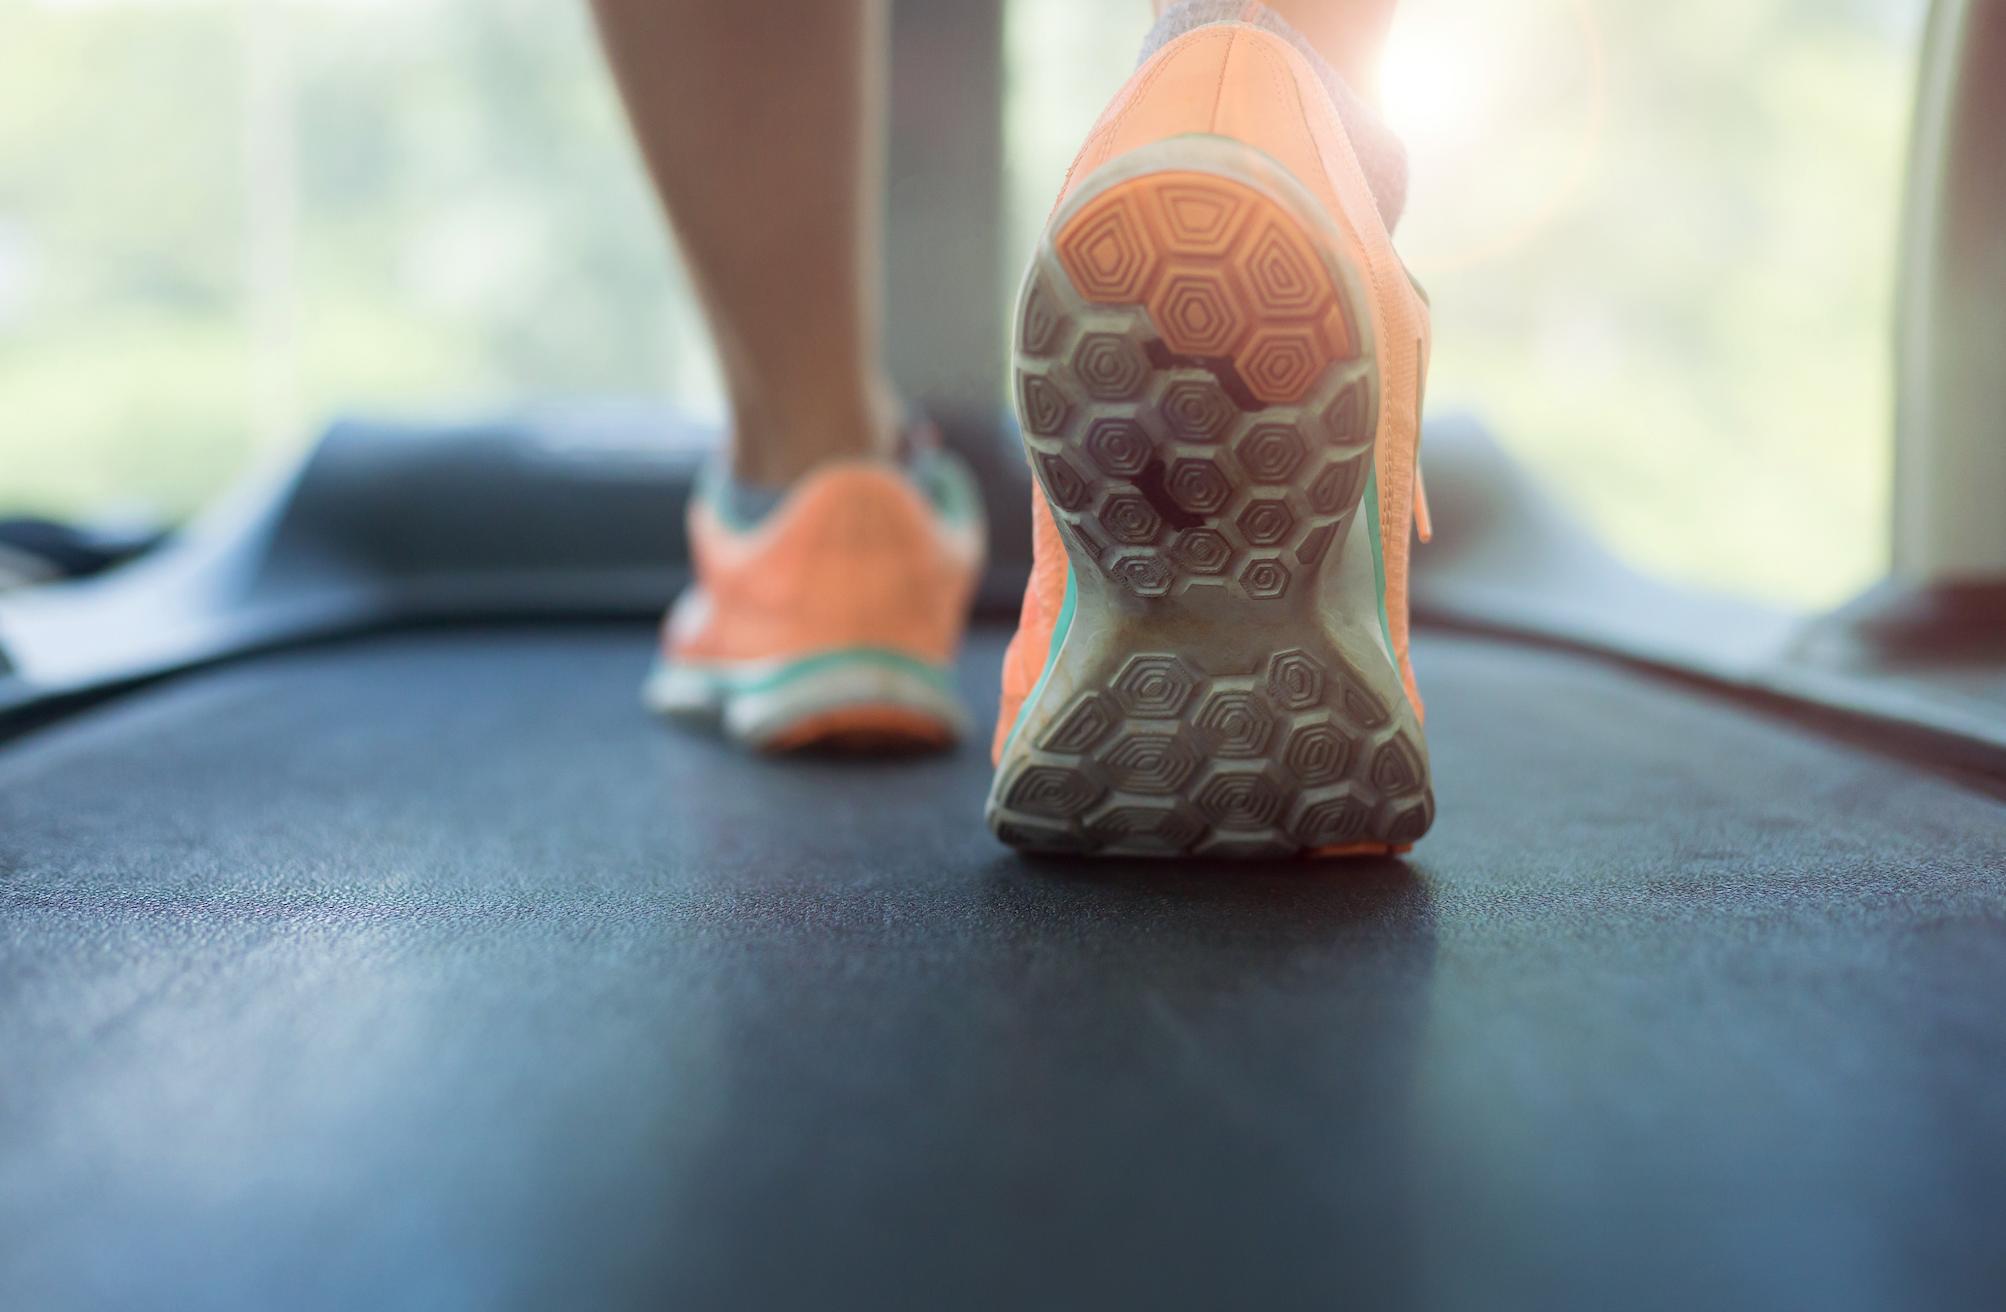 proform smart performance 600i treadmill review